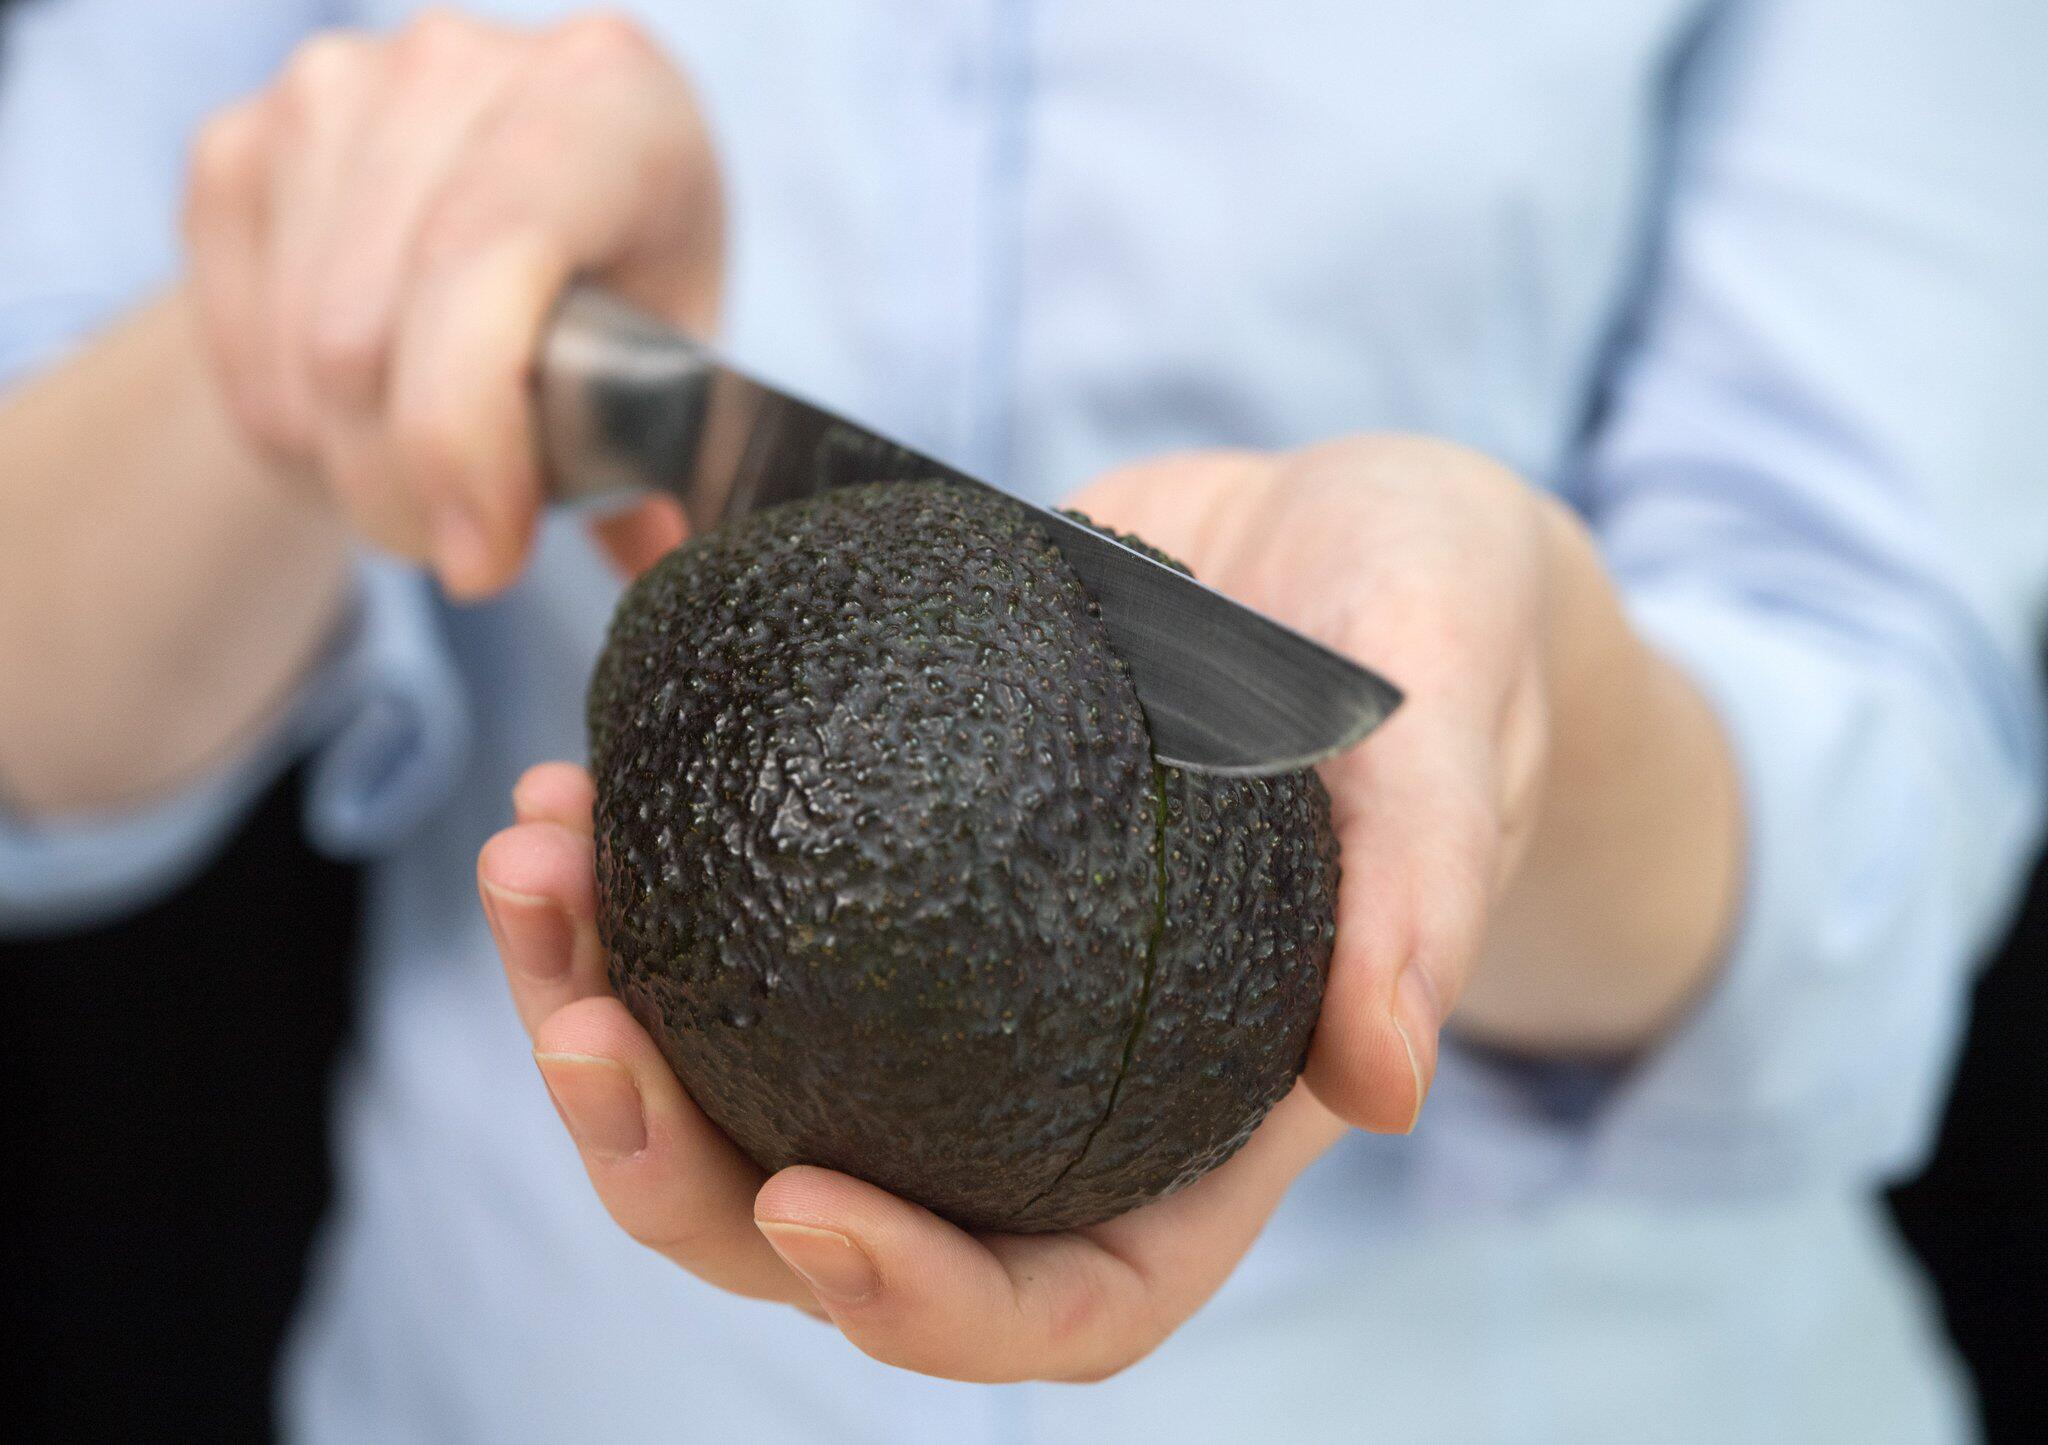 Bild zu Avocado wird geschnitten